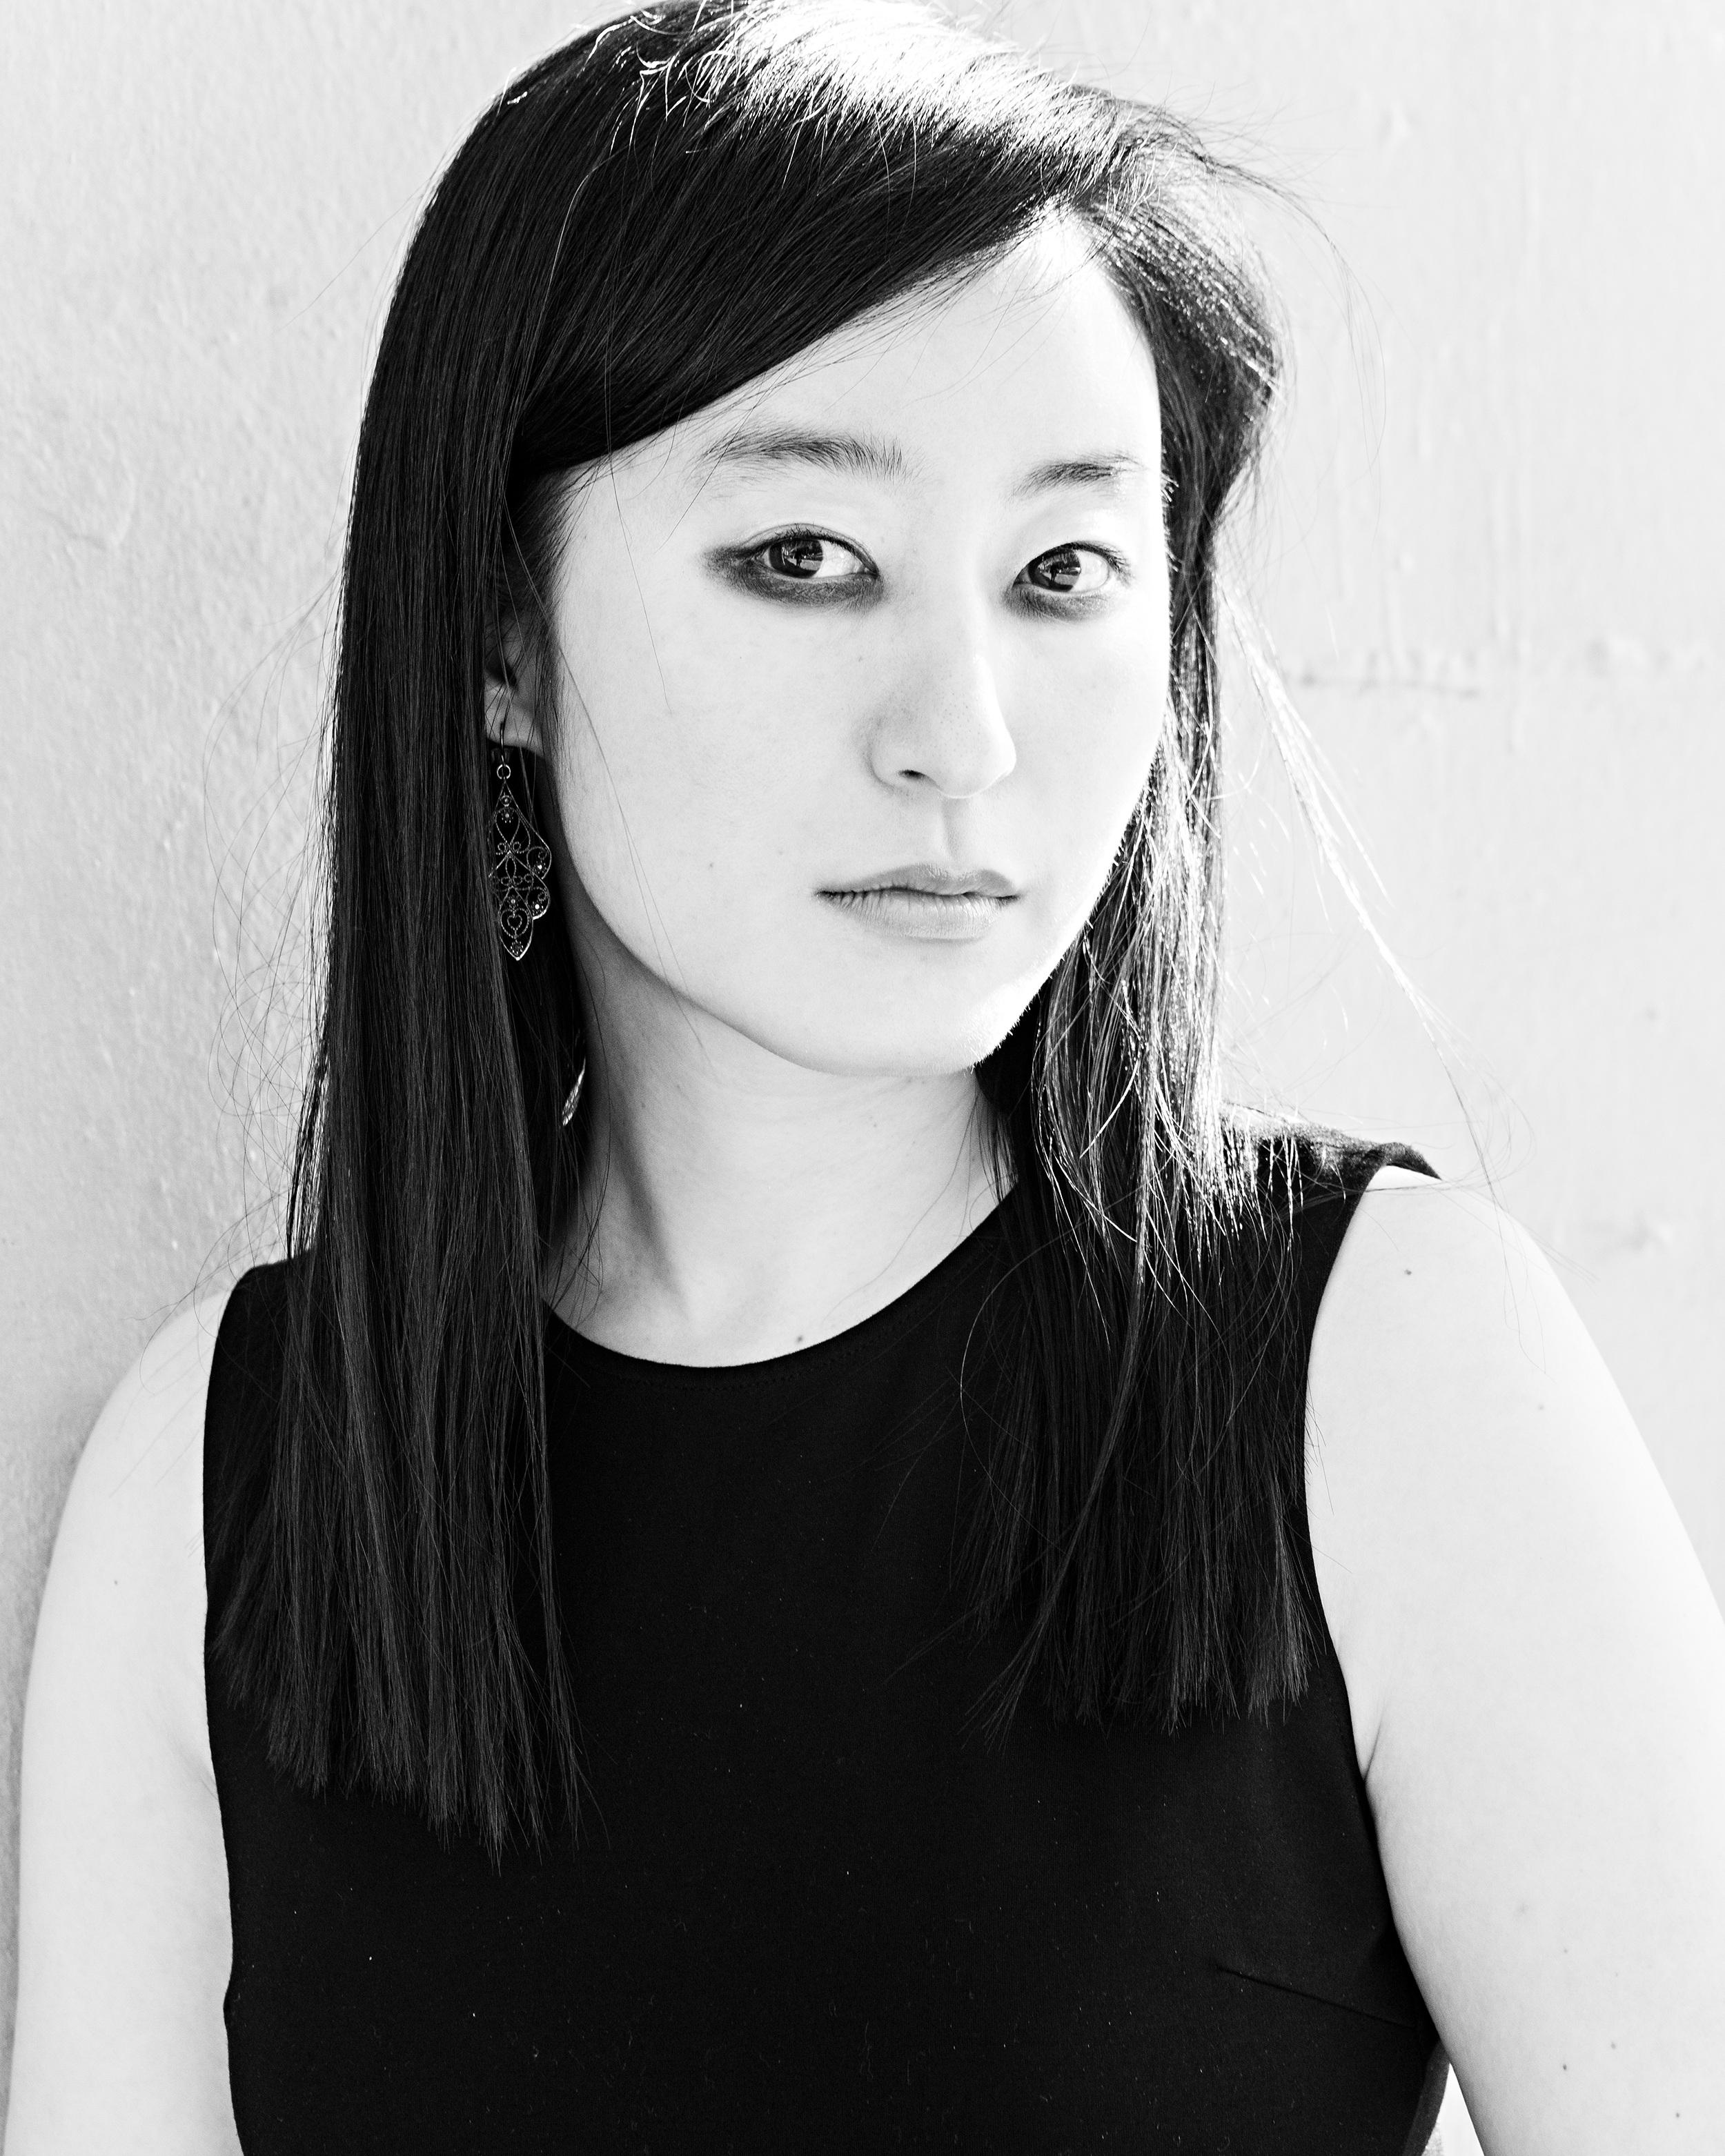 Kwon+headshot+-+Smeeta+Mahanti+B%26W%2C+vertical.jpg